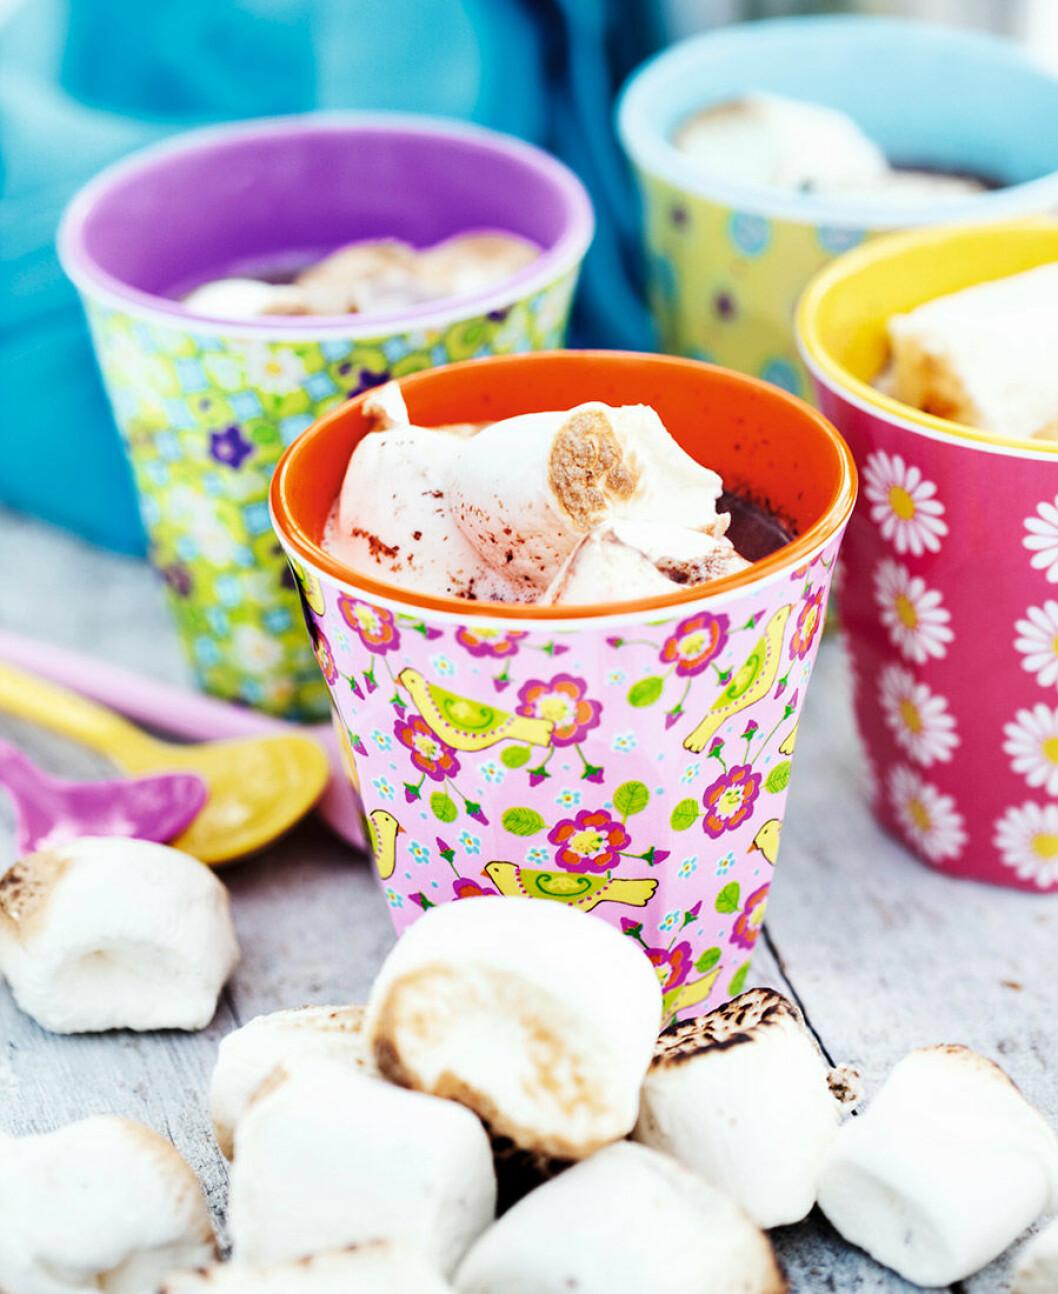 Lyxig varm choklad med marshmallows.